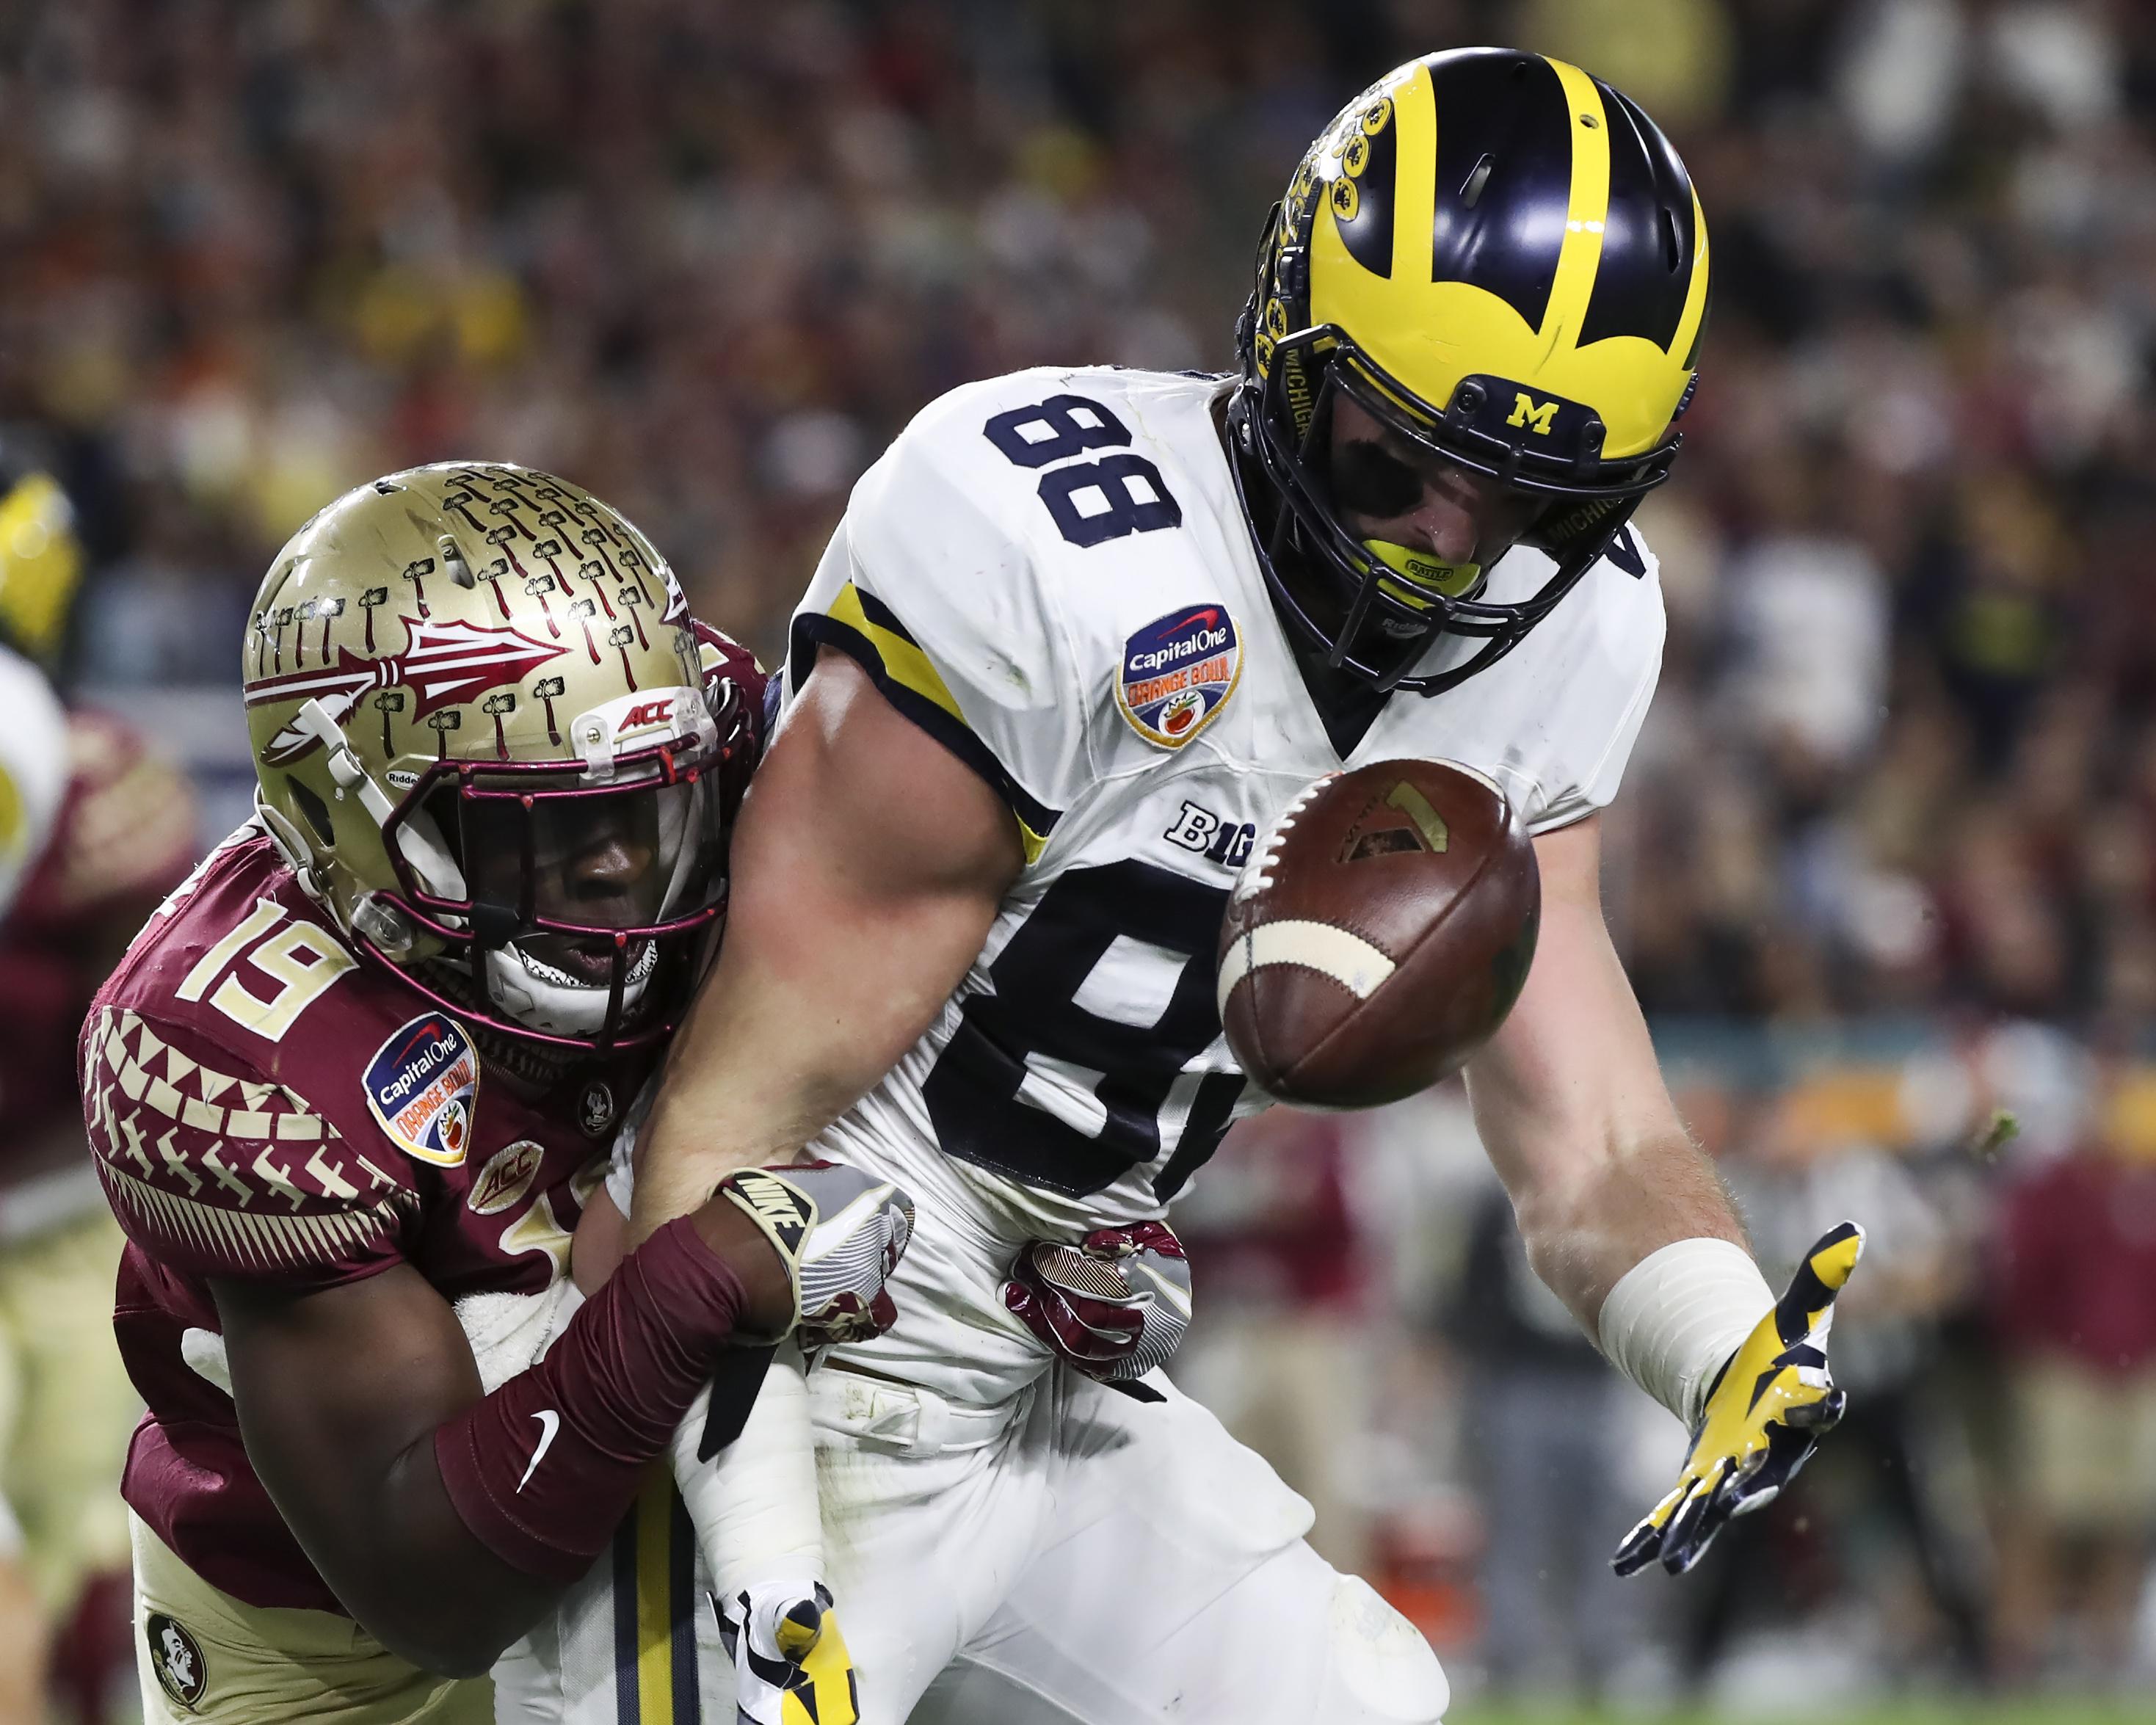 NCAA Football: Orange Bowl-Michigan vs Florida State